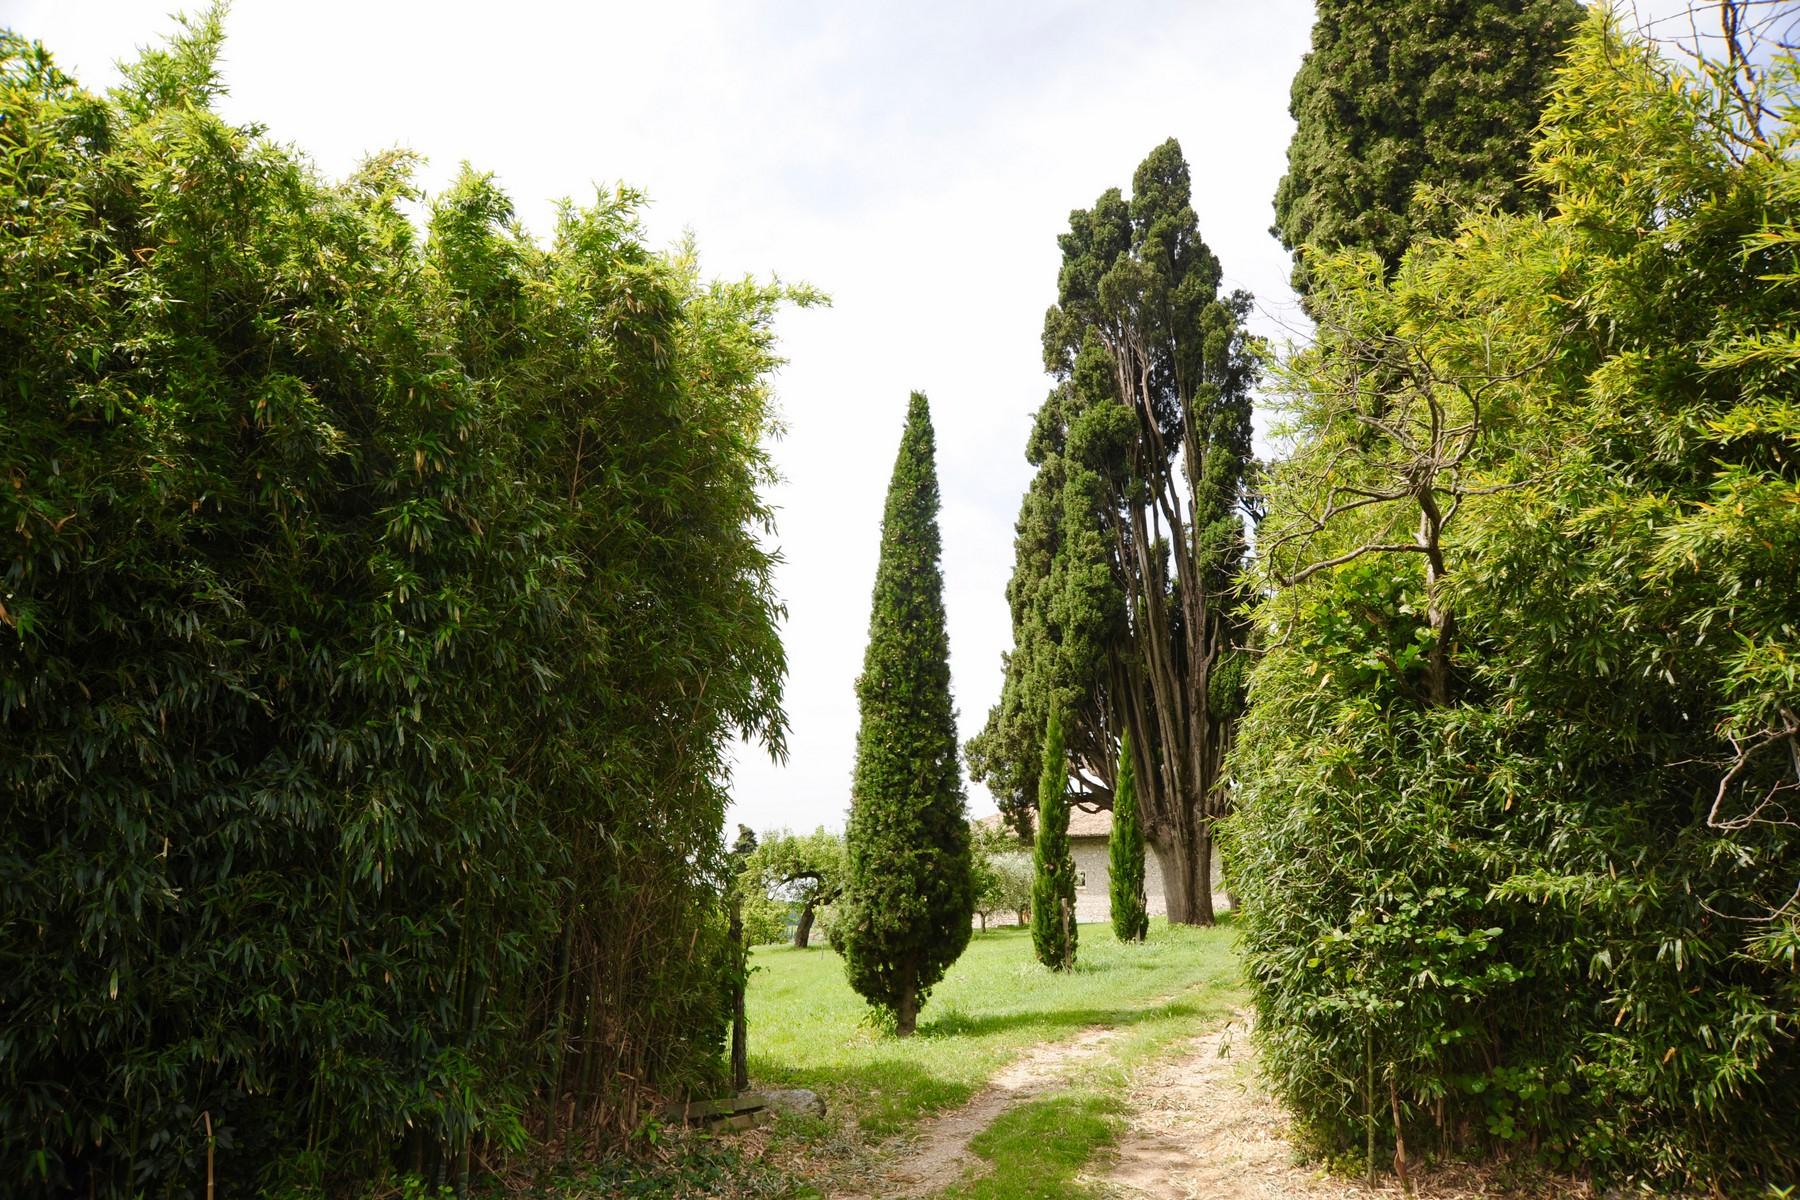 Villa in Vendita a Verona: 5 locali, 450 mq - Foto 17